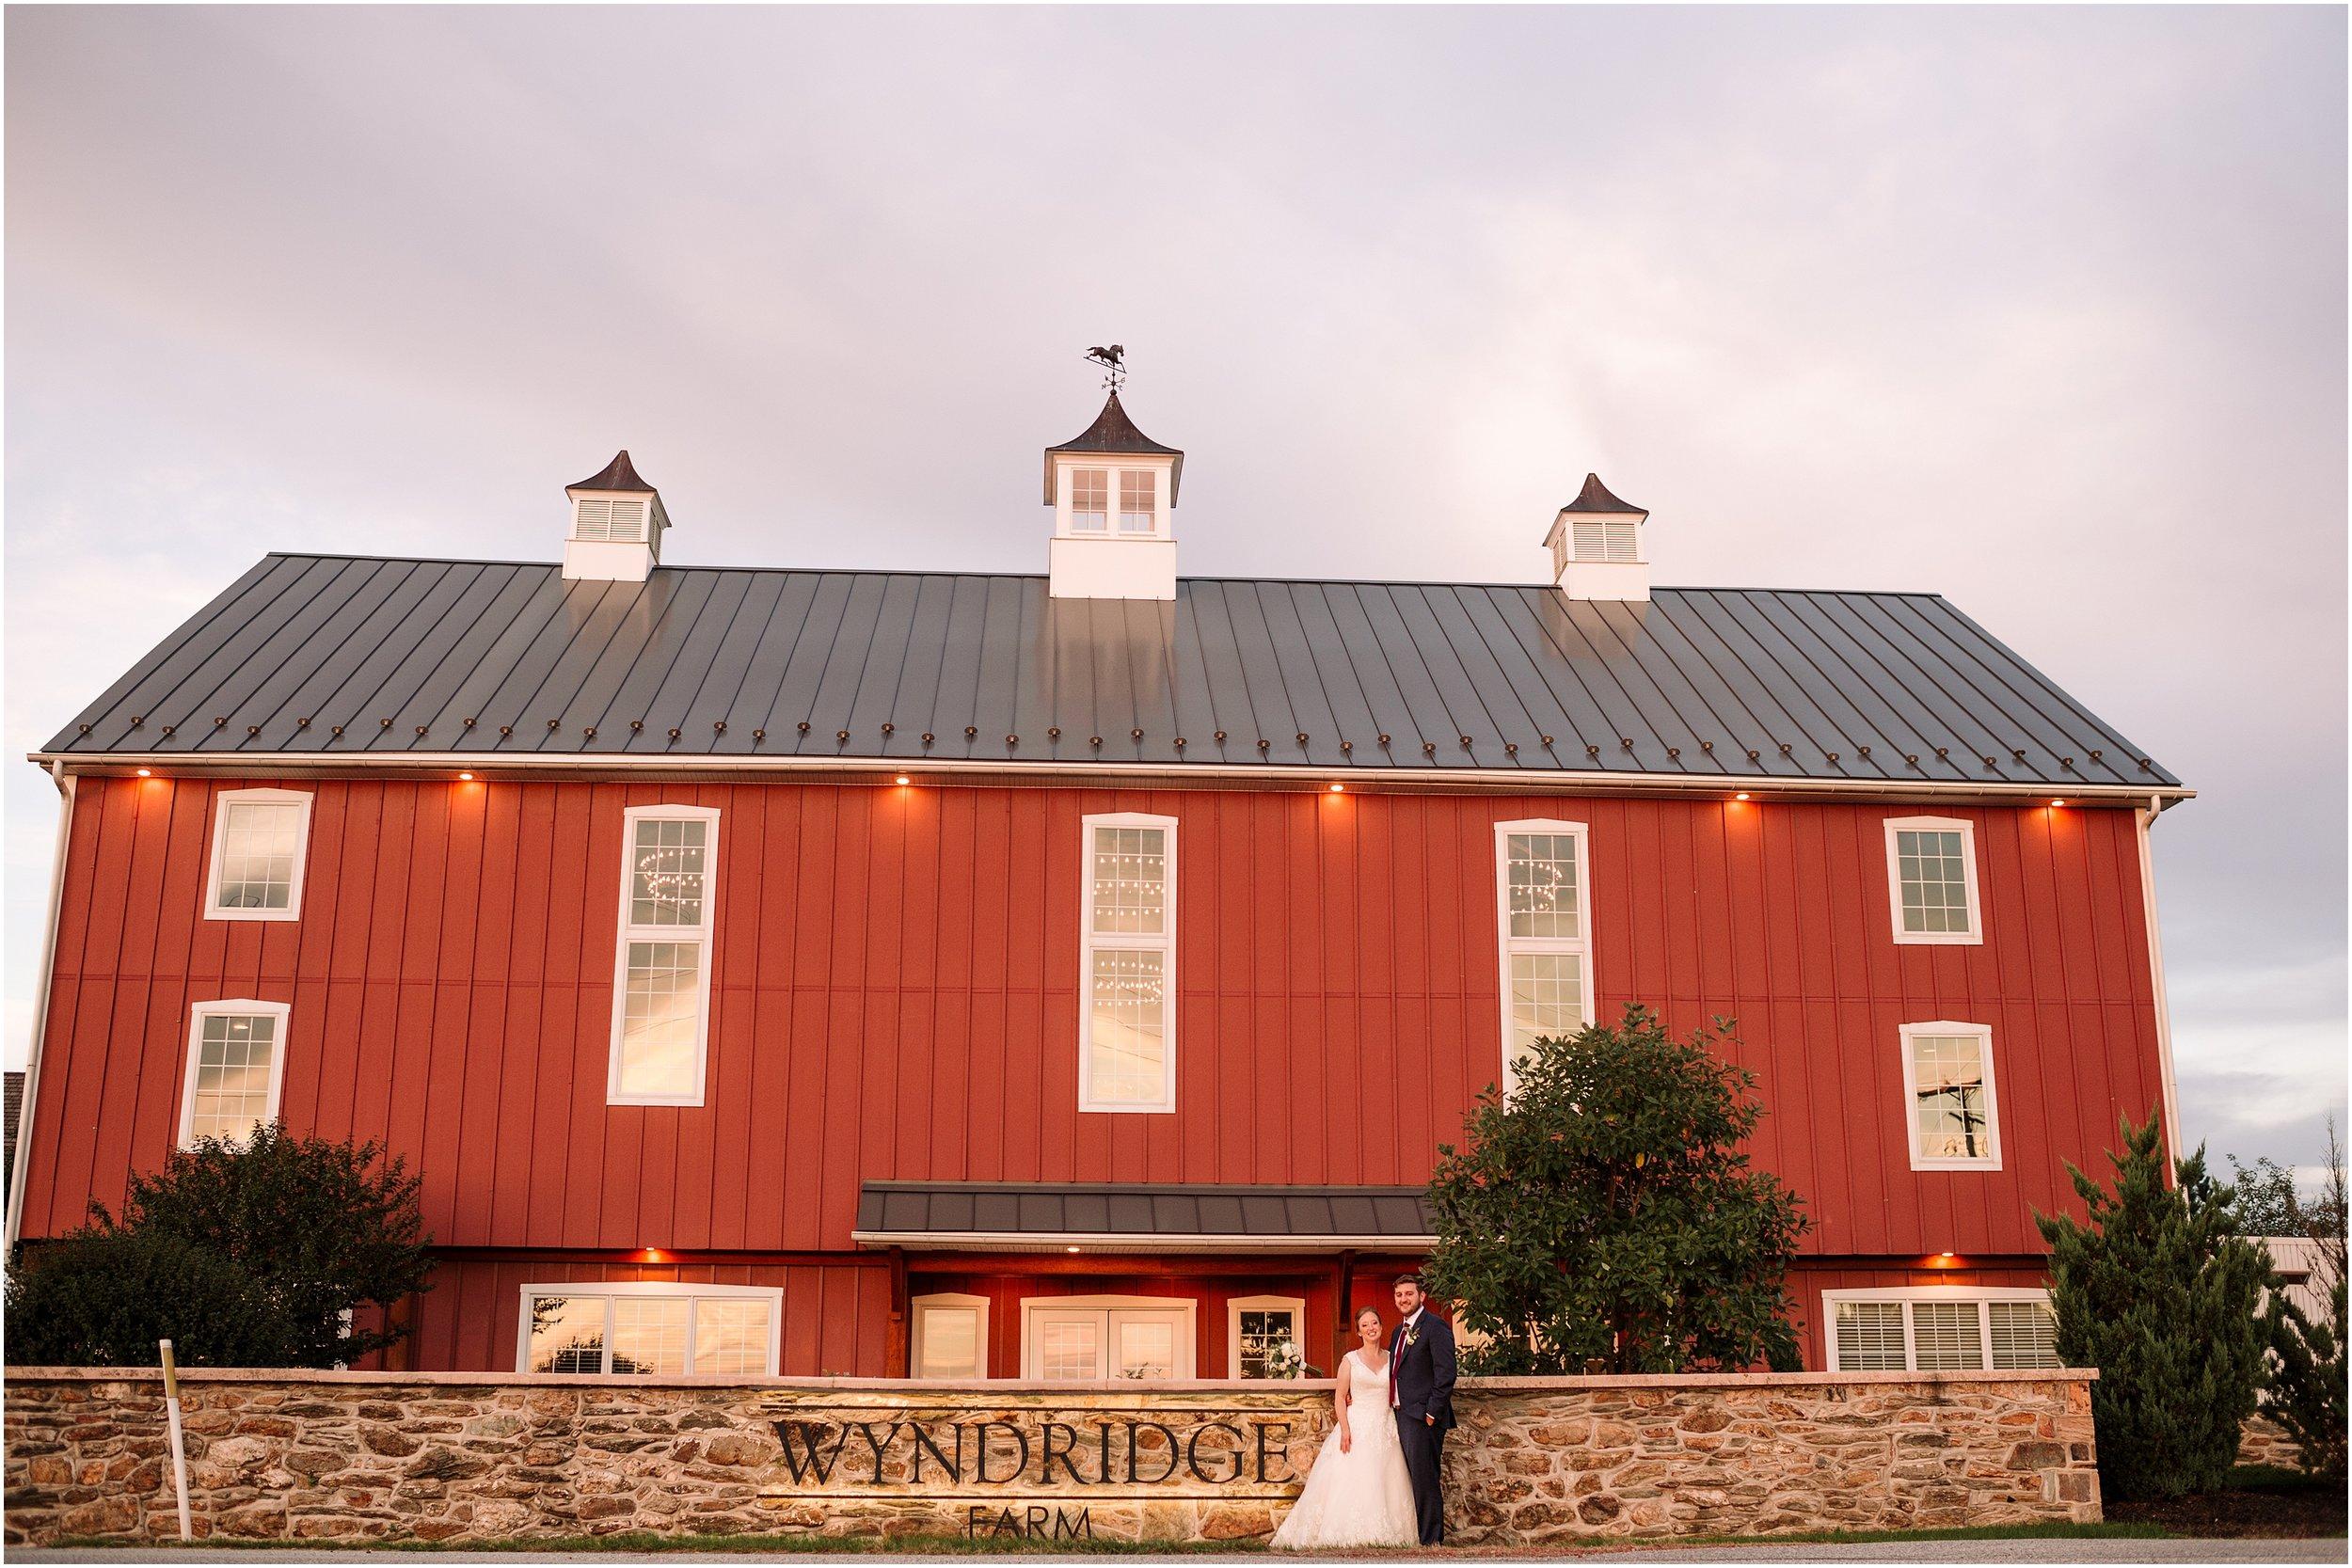 hannah leigh photography Wyndridge Farm Wedding York PA_1565.jpg